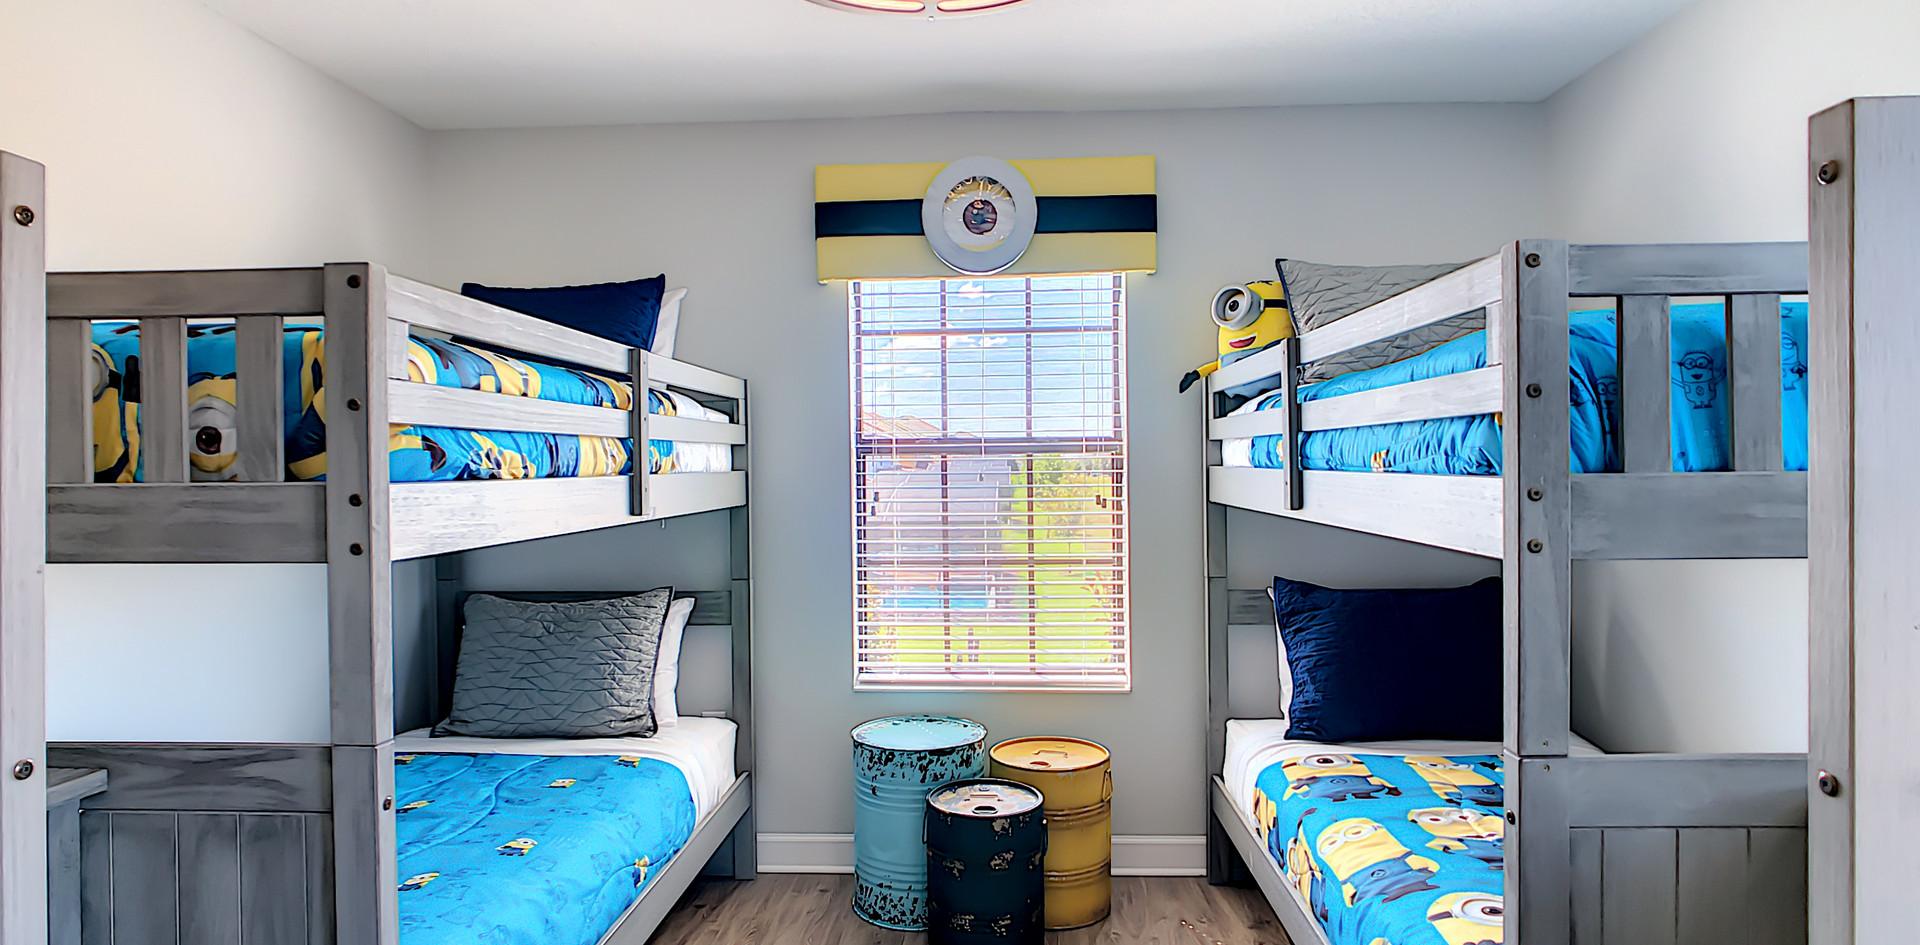 Paradise Manor ONE - Minion Bunk Room